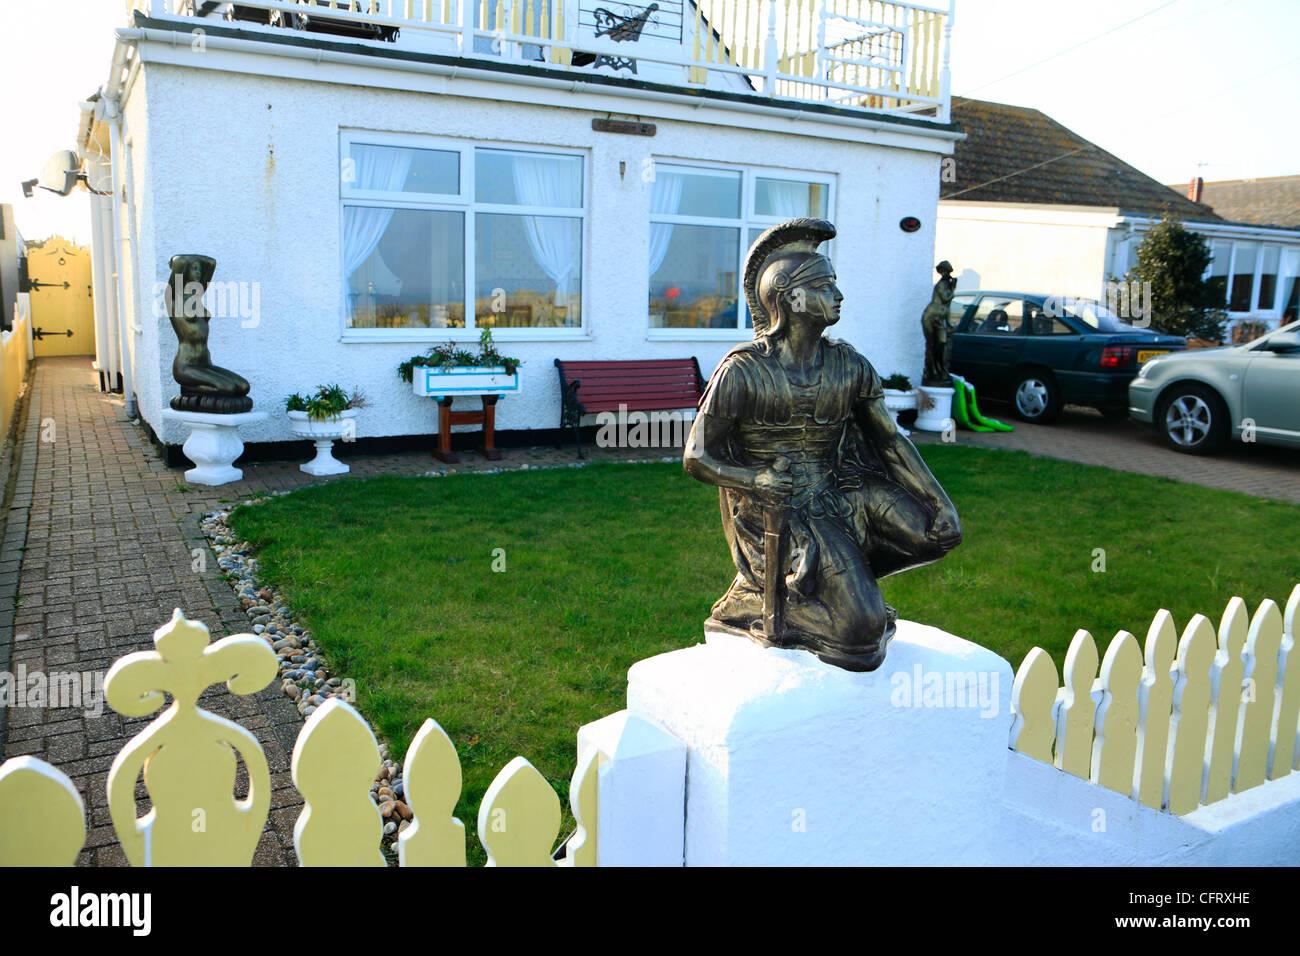 Ornamental Roman Centurion figure on gatepost of house, Greatstone, Kent - Stock Image